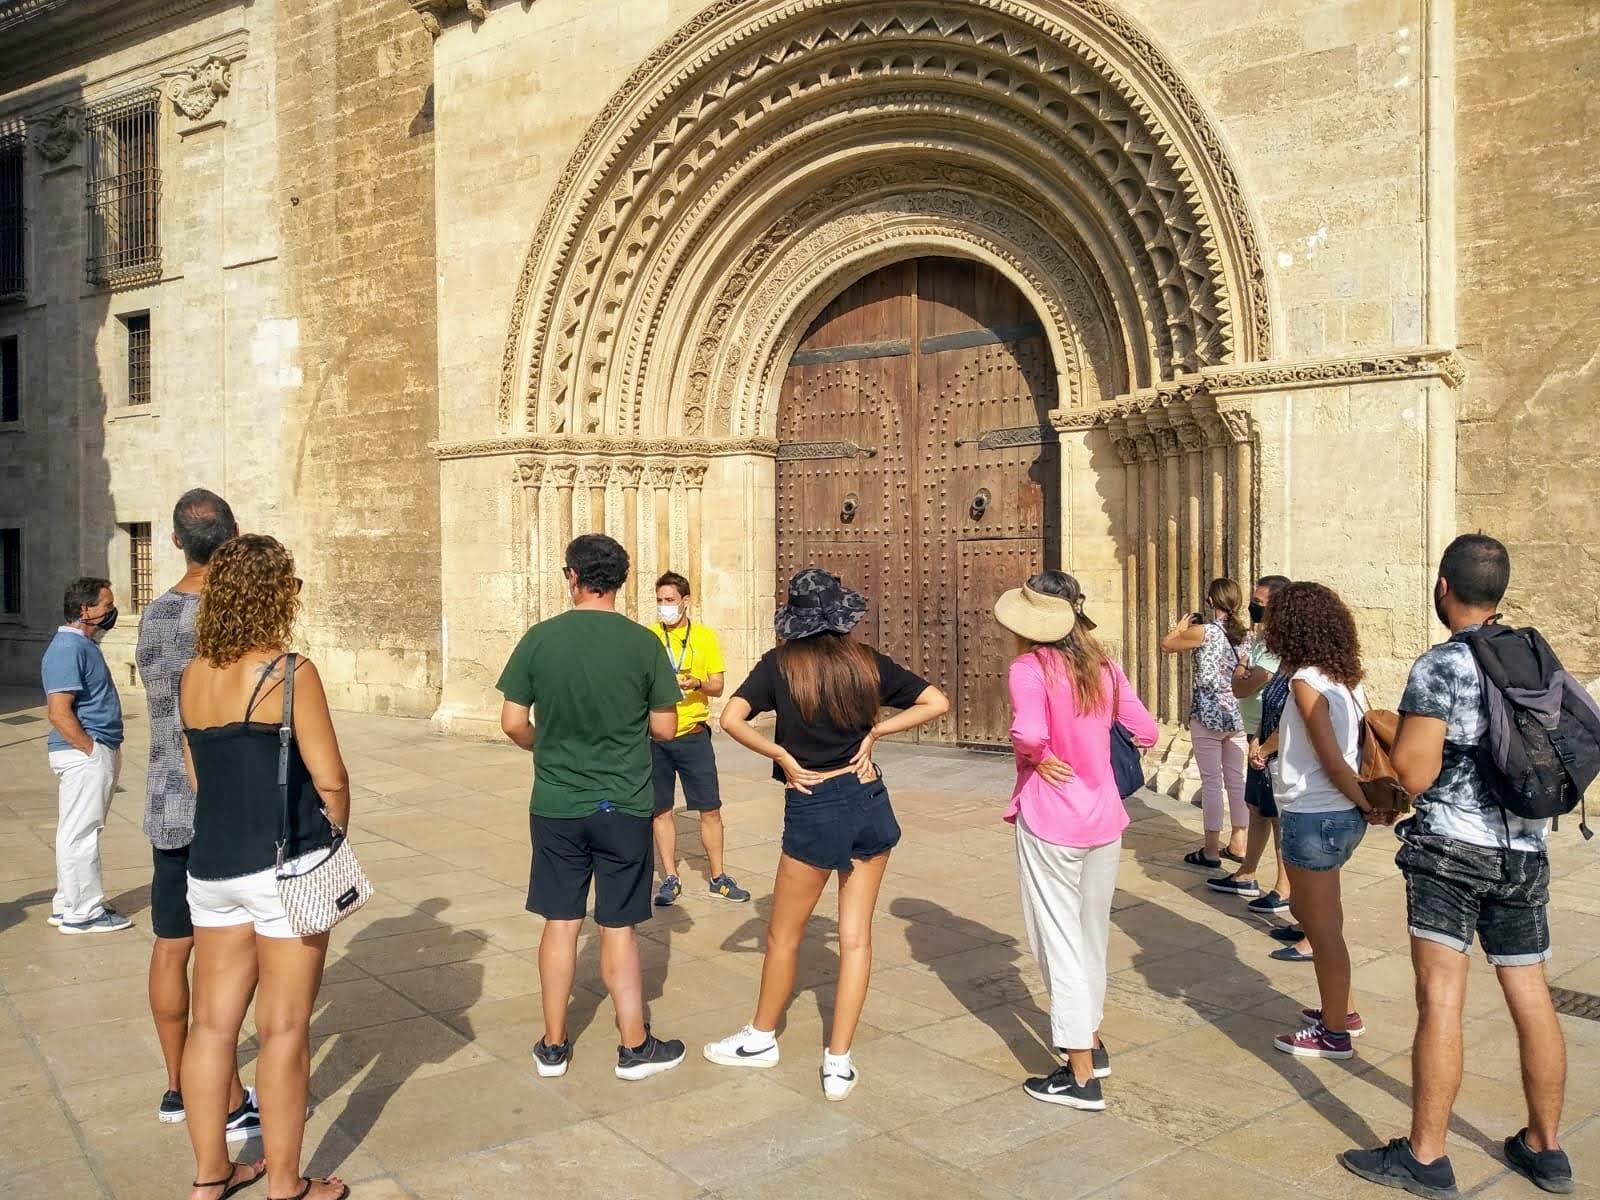 Free Tour lo mejor de la Ciutat Vella de Valencia